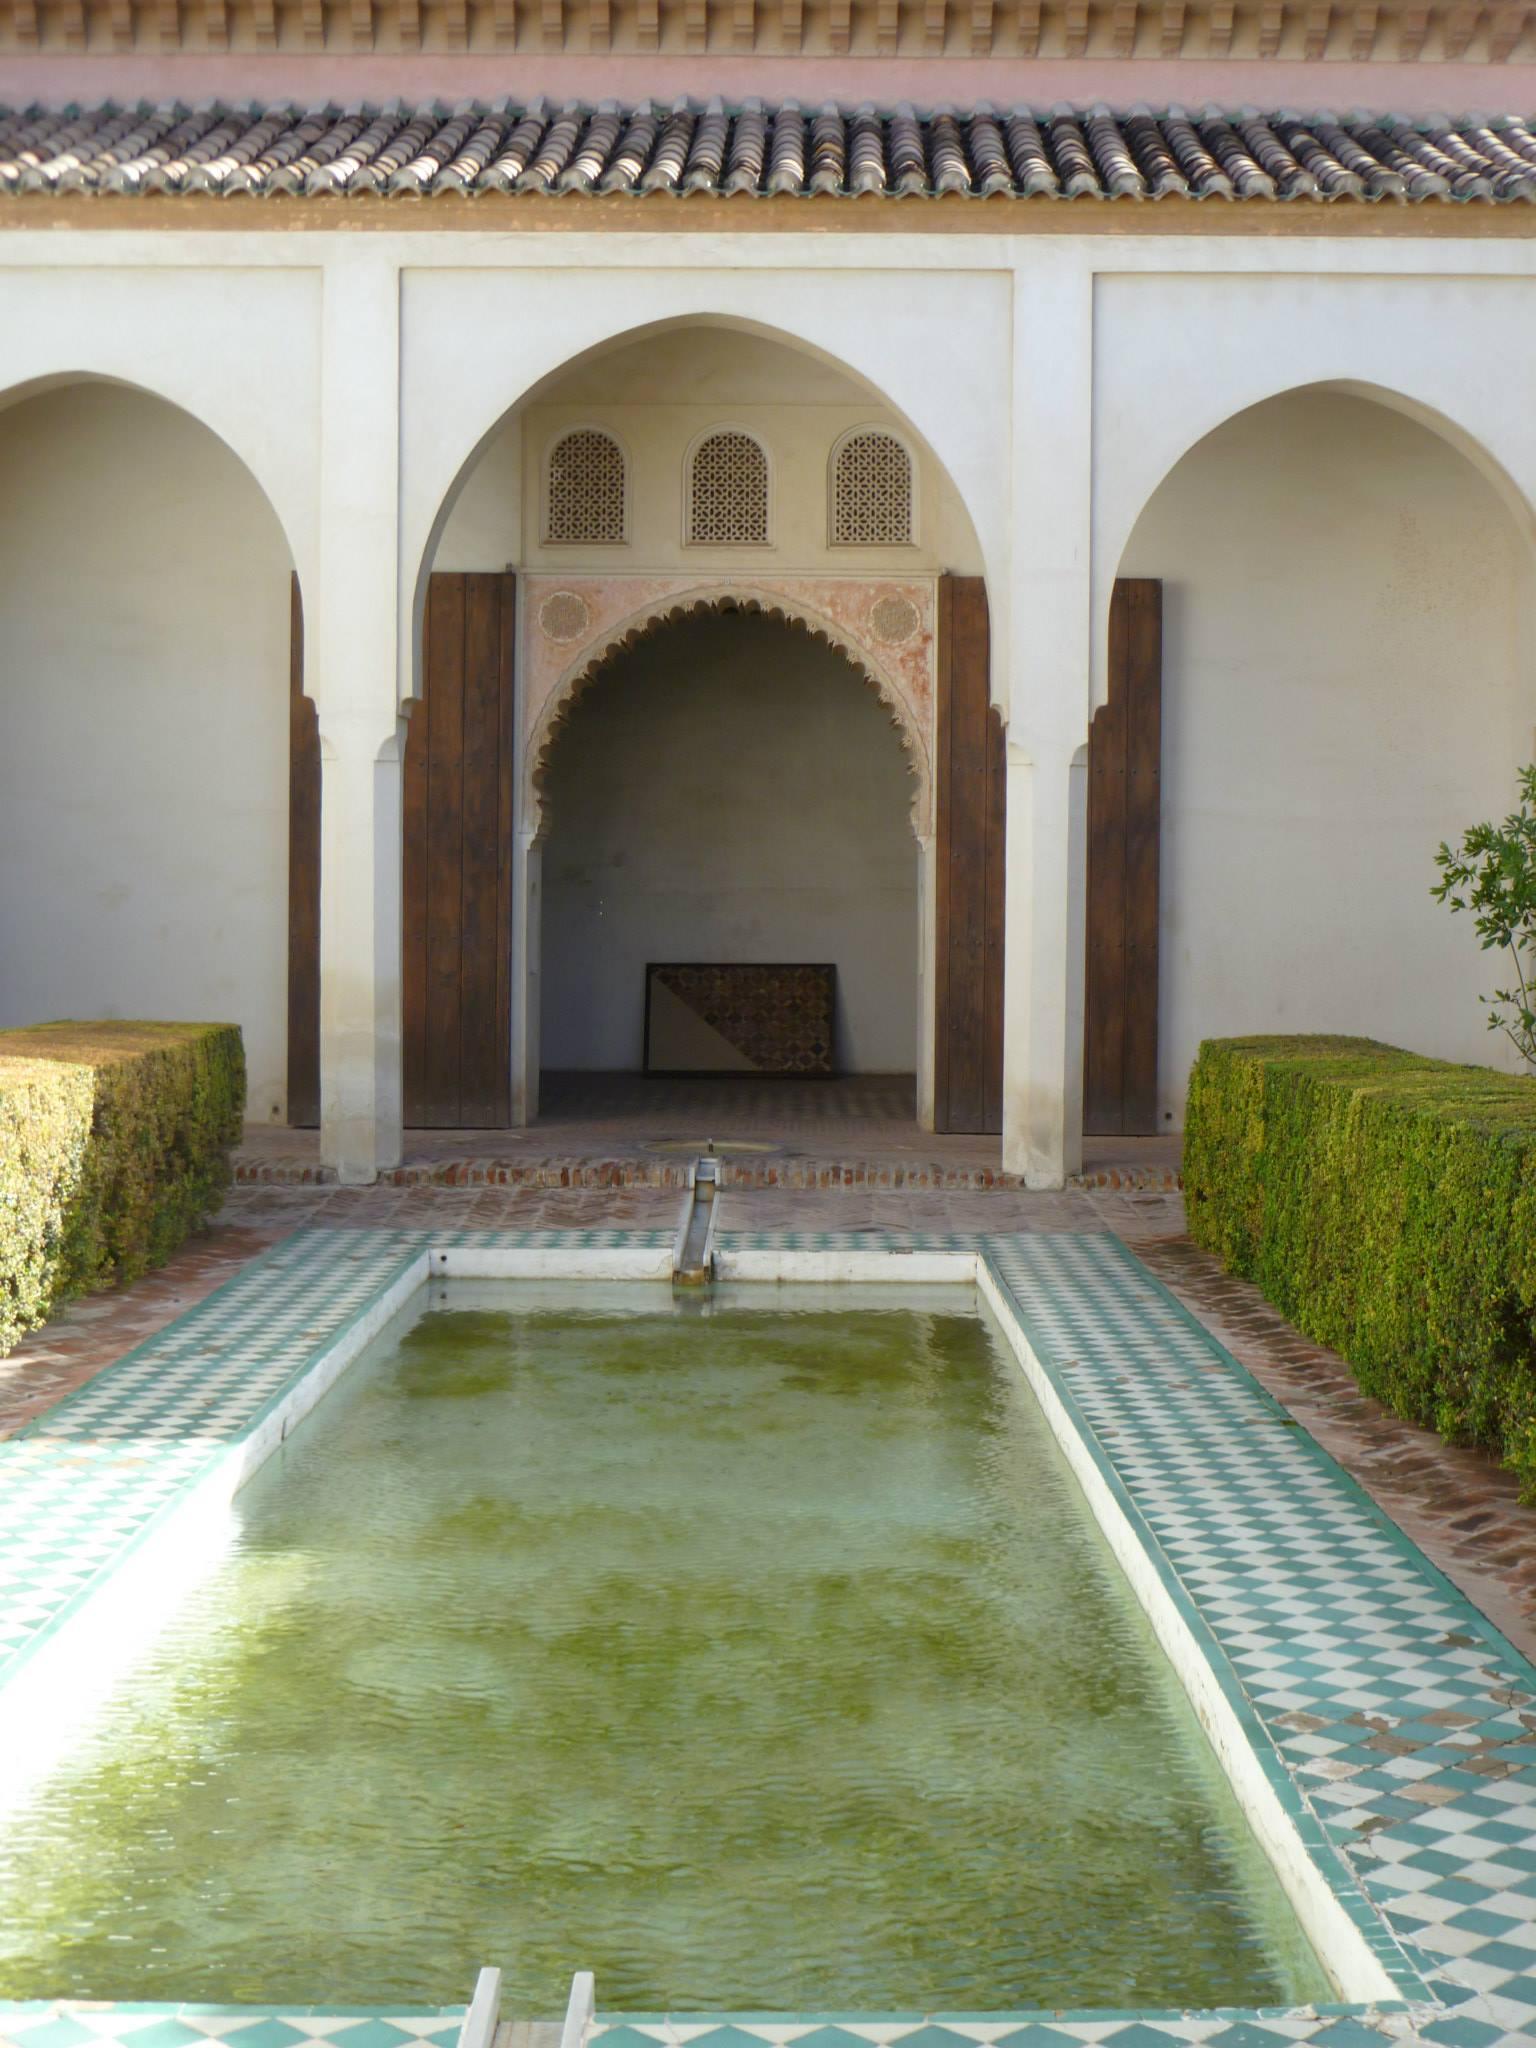 Inside the Alcazaba